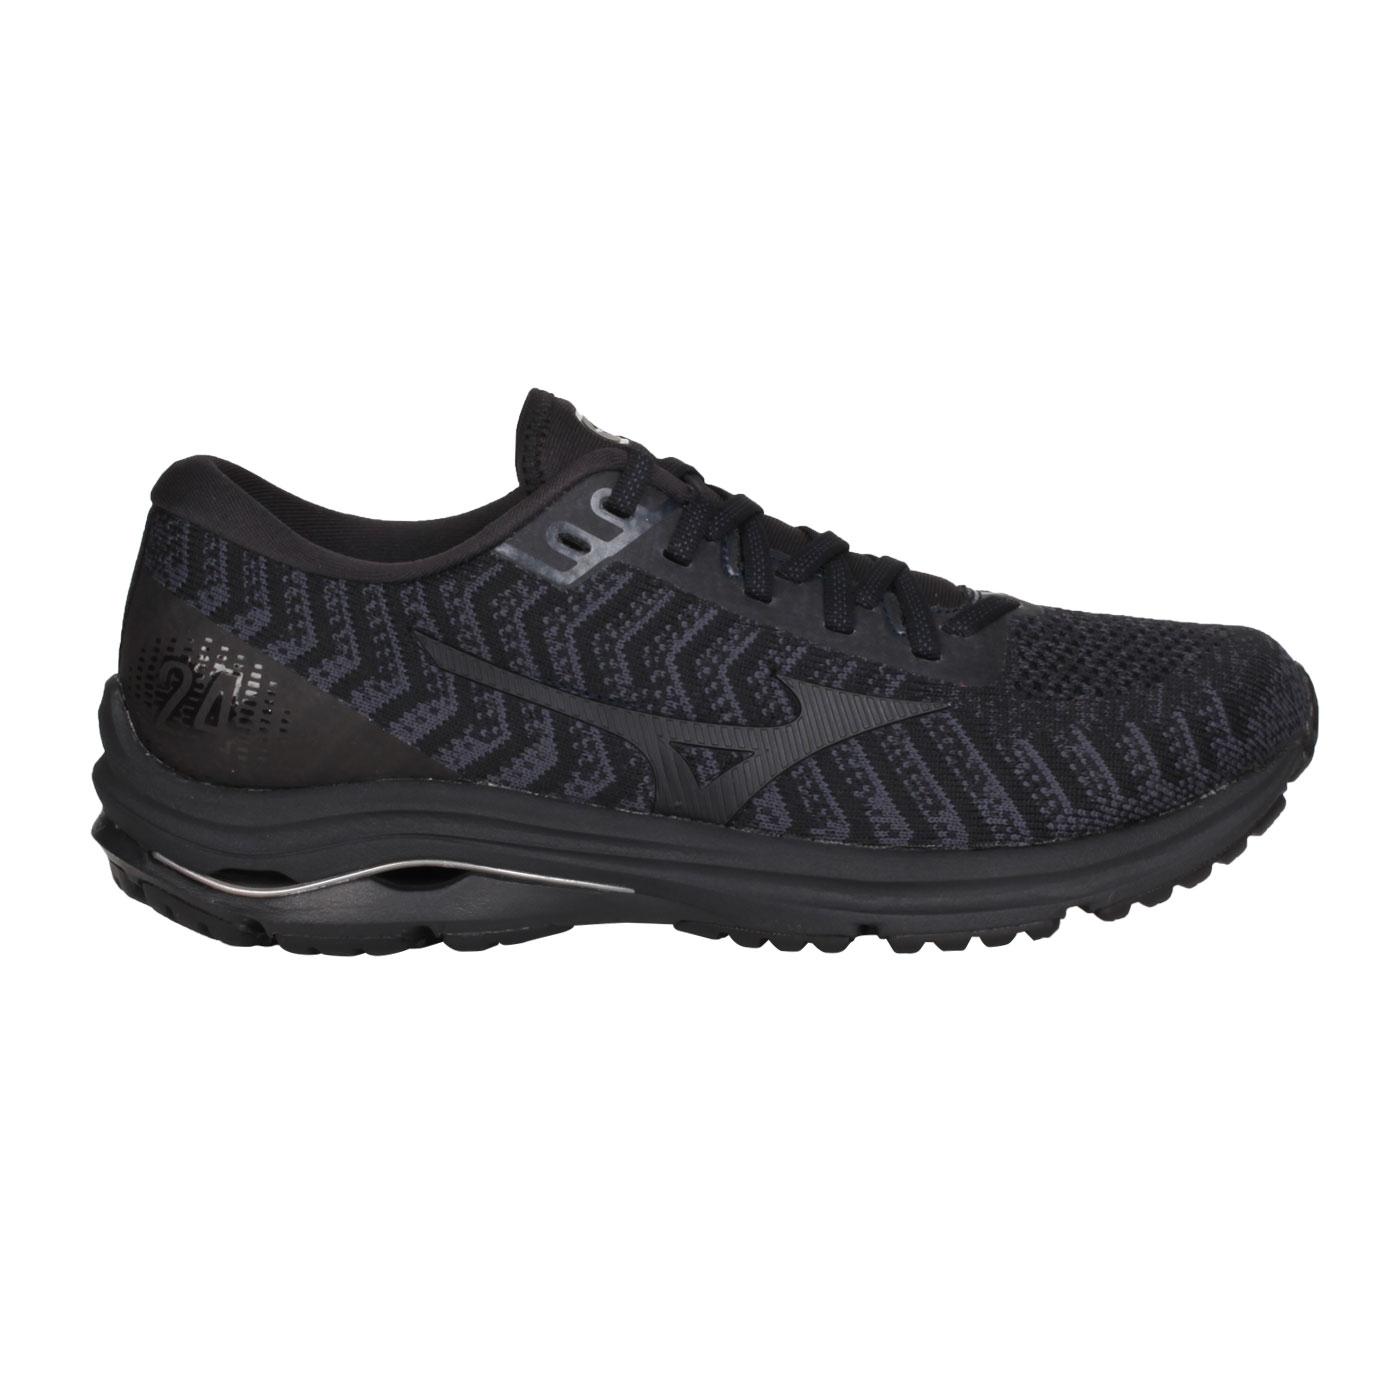 MIZUNO 男款慢跑鞋  @WAVE RIDER 24 WAVEKNIT@J1GC207509 - 黑淺藍